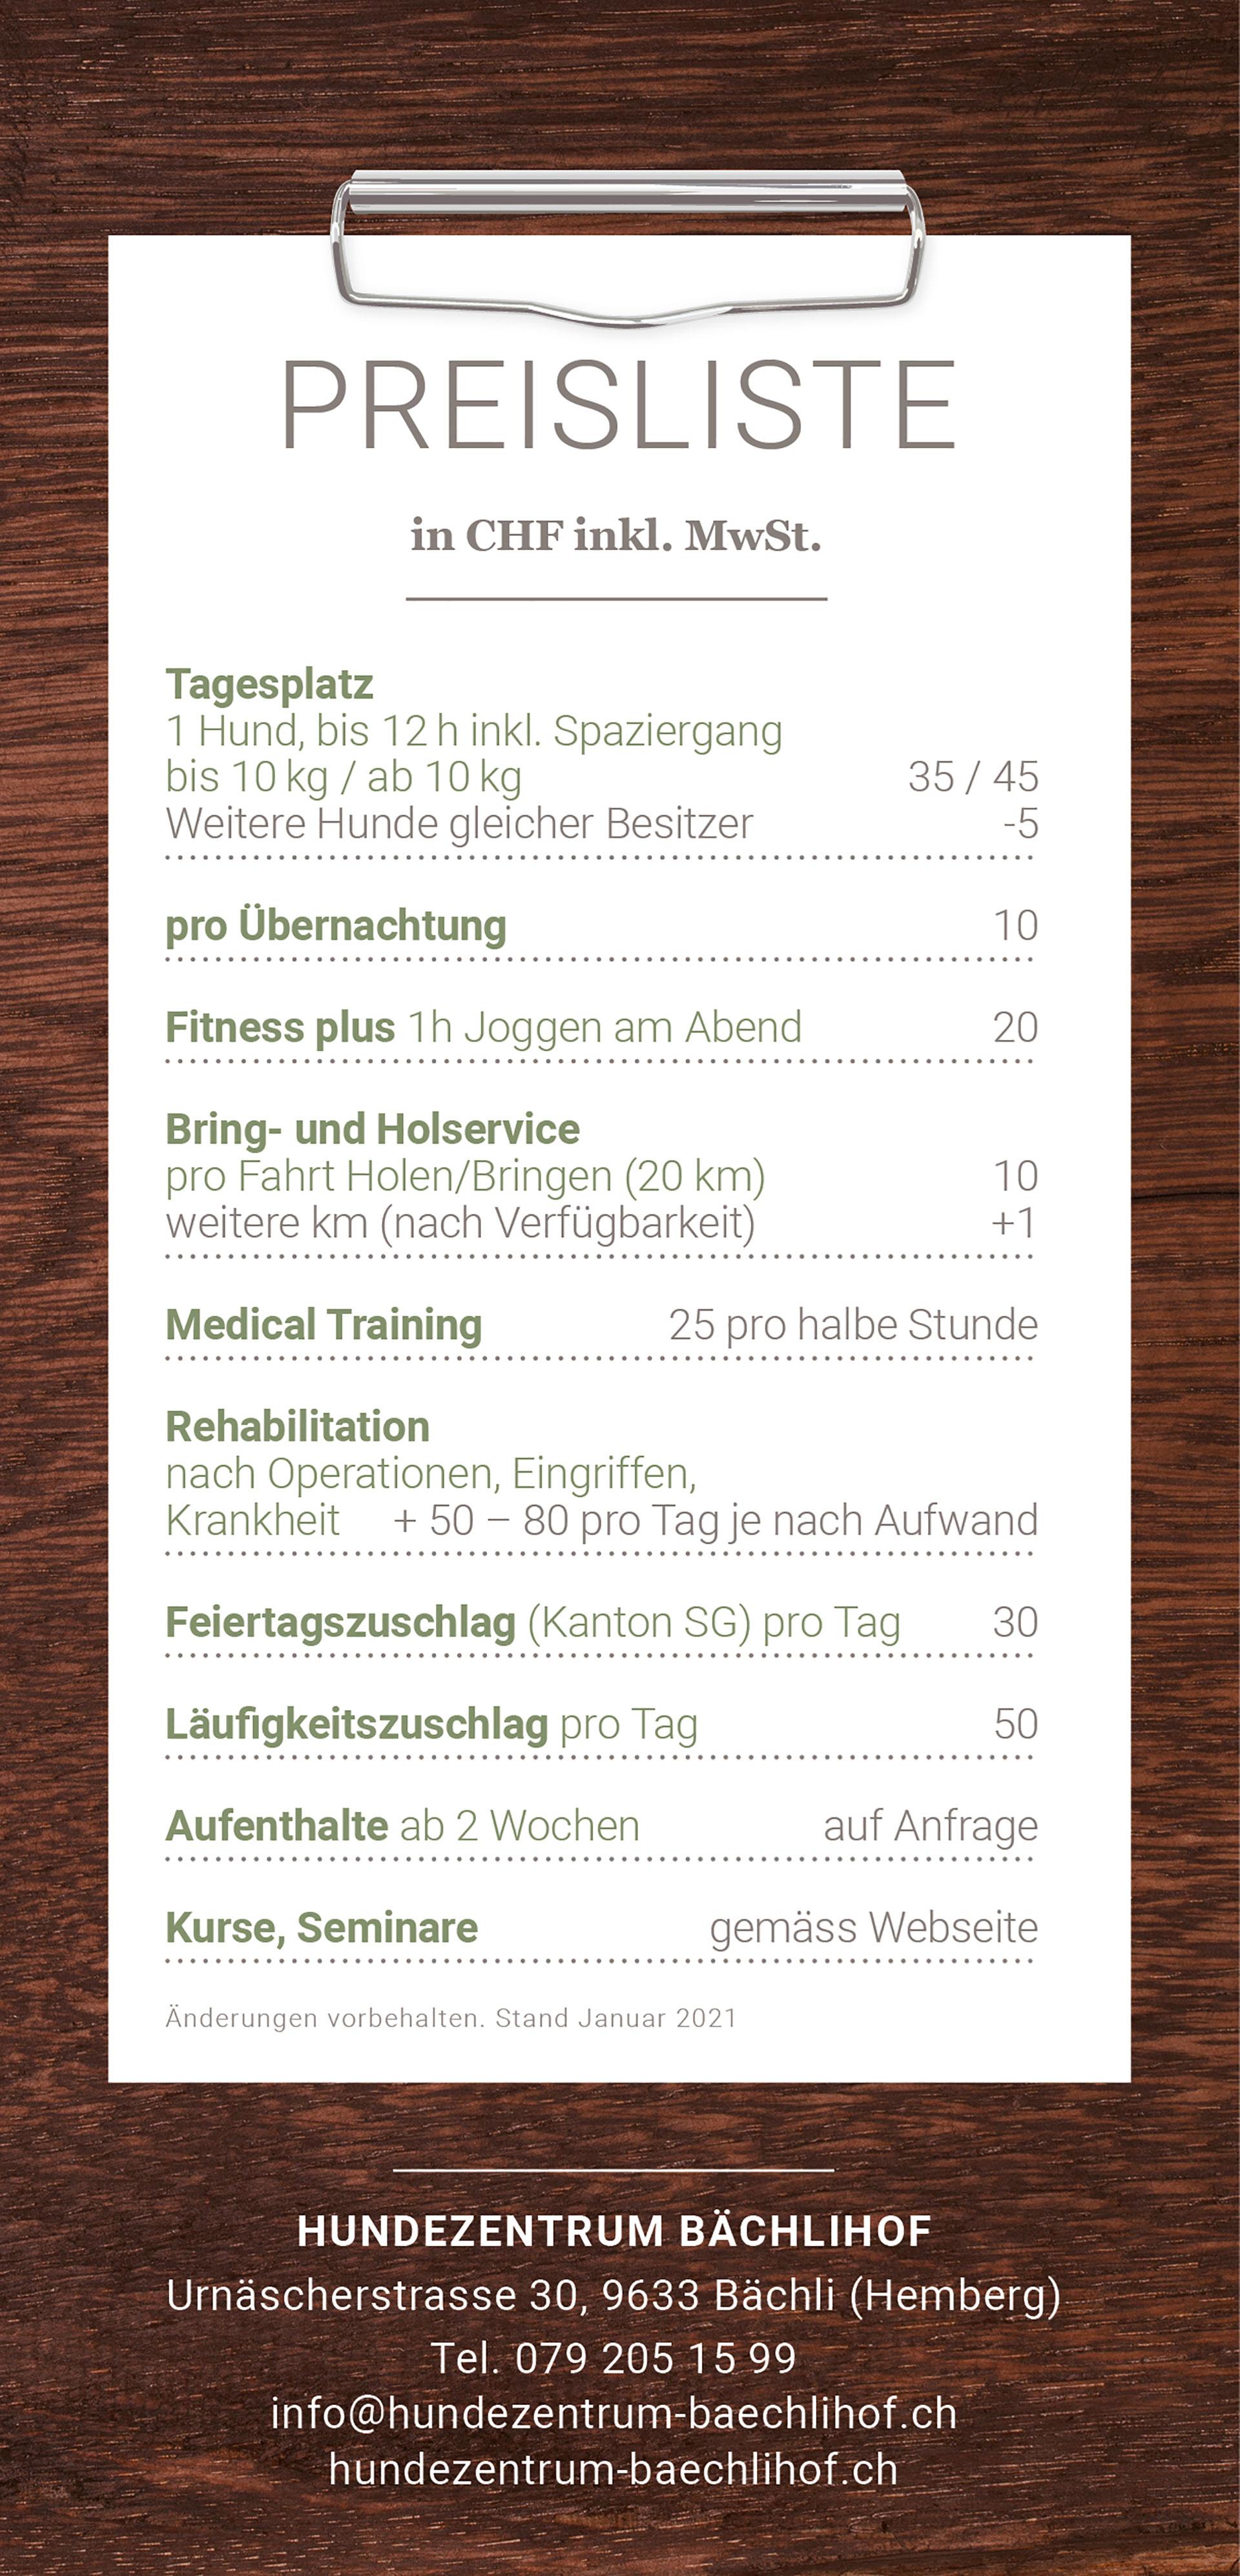 Baechlihof_Hundezentrum_Preisliste20212.jpg